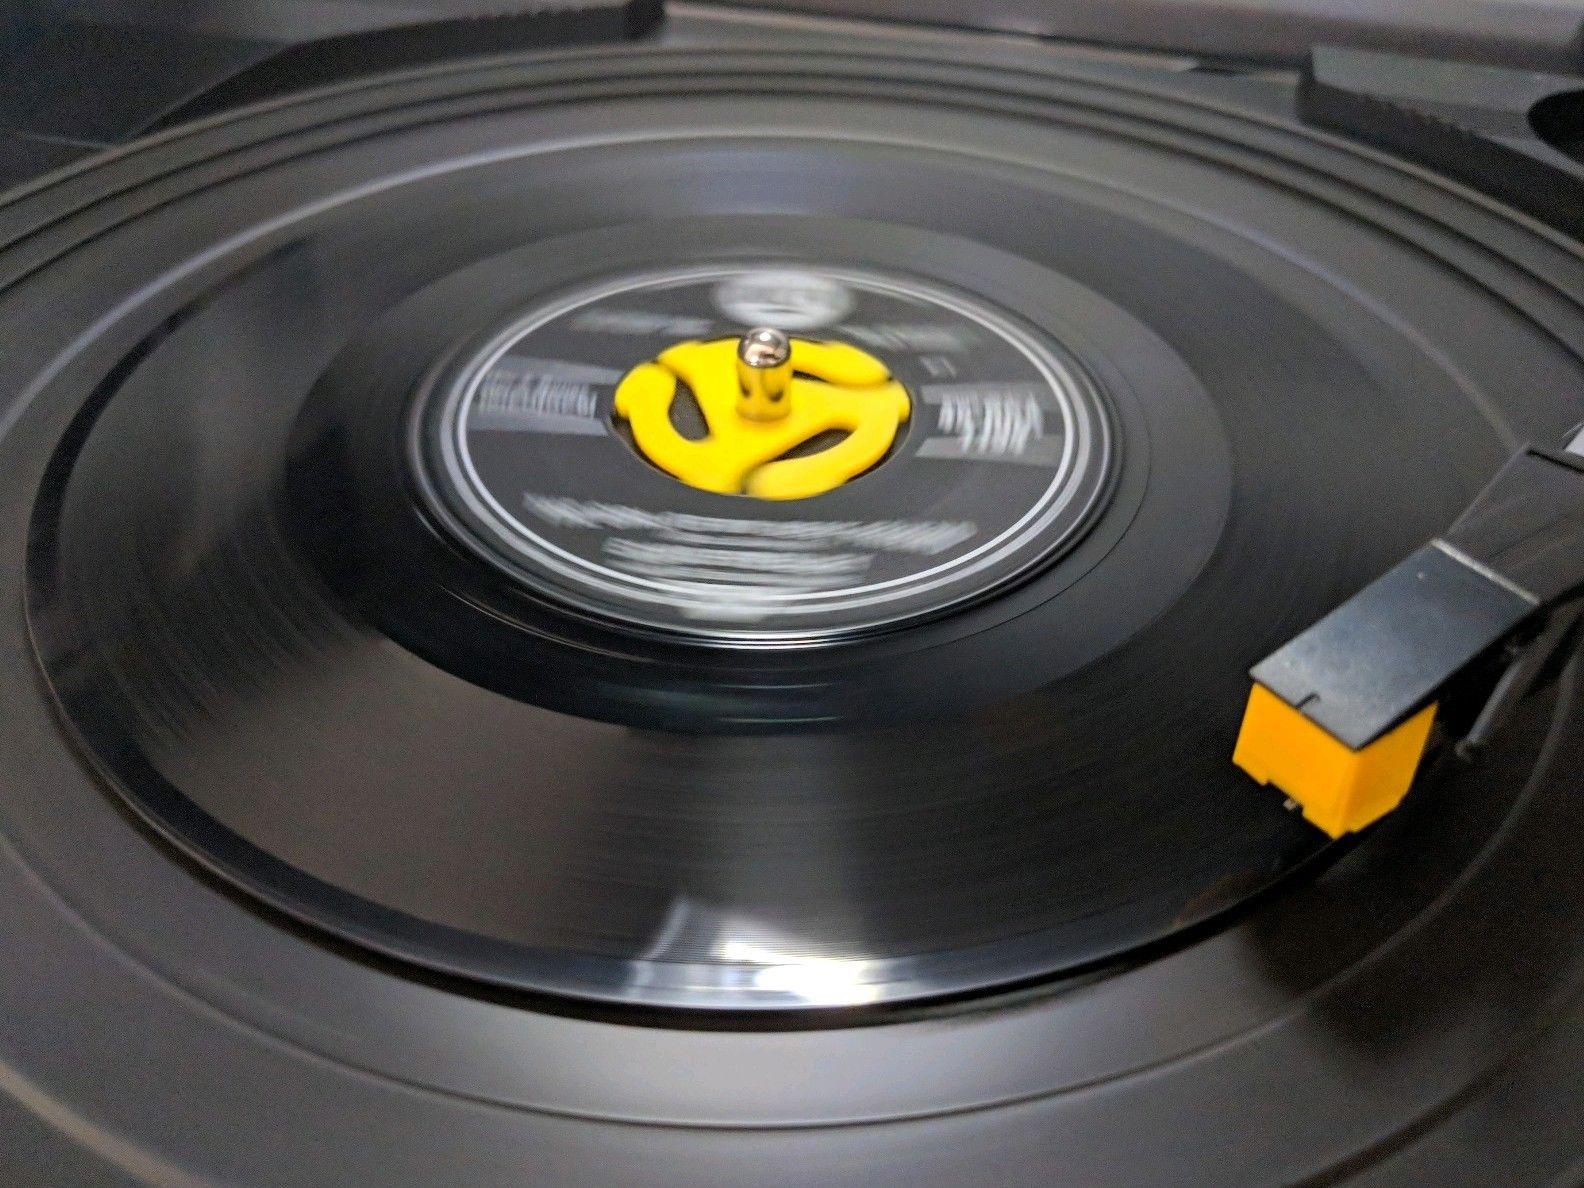 10-Pack-45RPM-Adaptors-Spider-Inserts-for-7-Vinyl-Records-Jukebox-NonSlip-273471287518-3